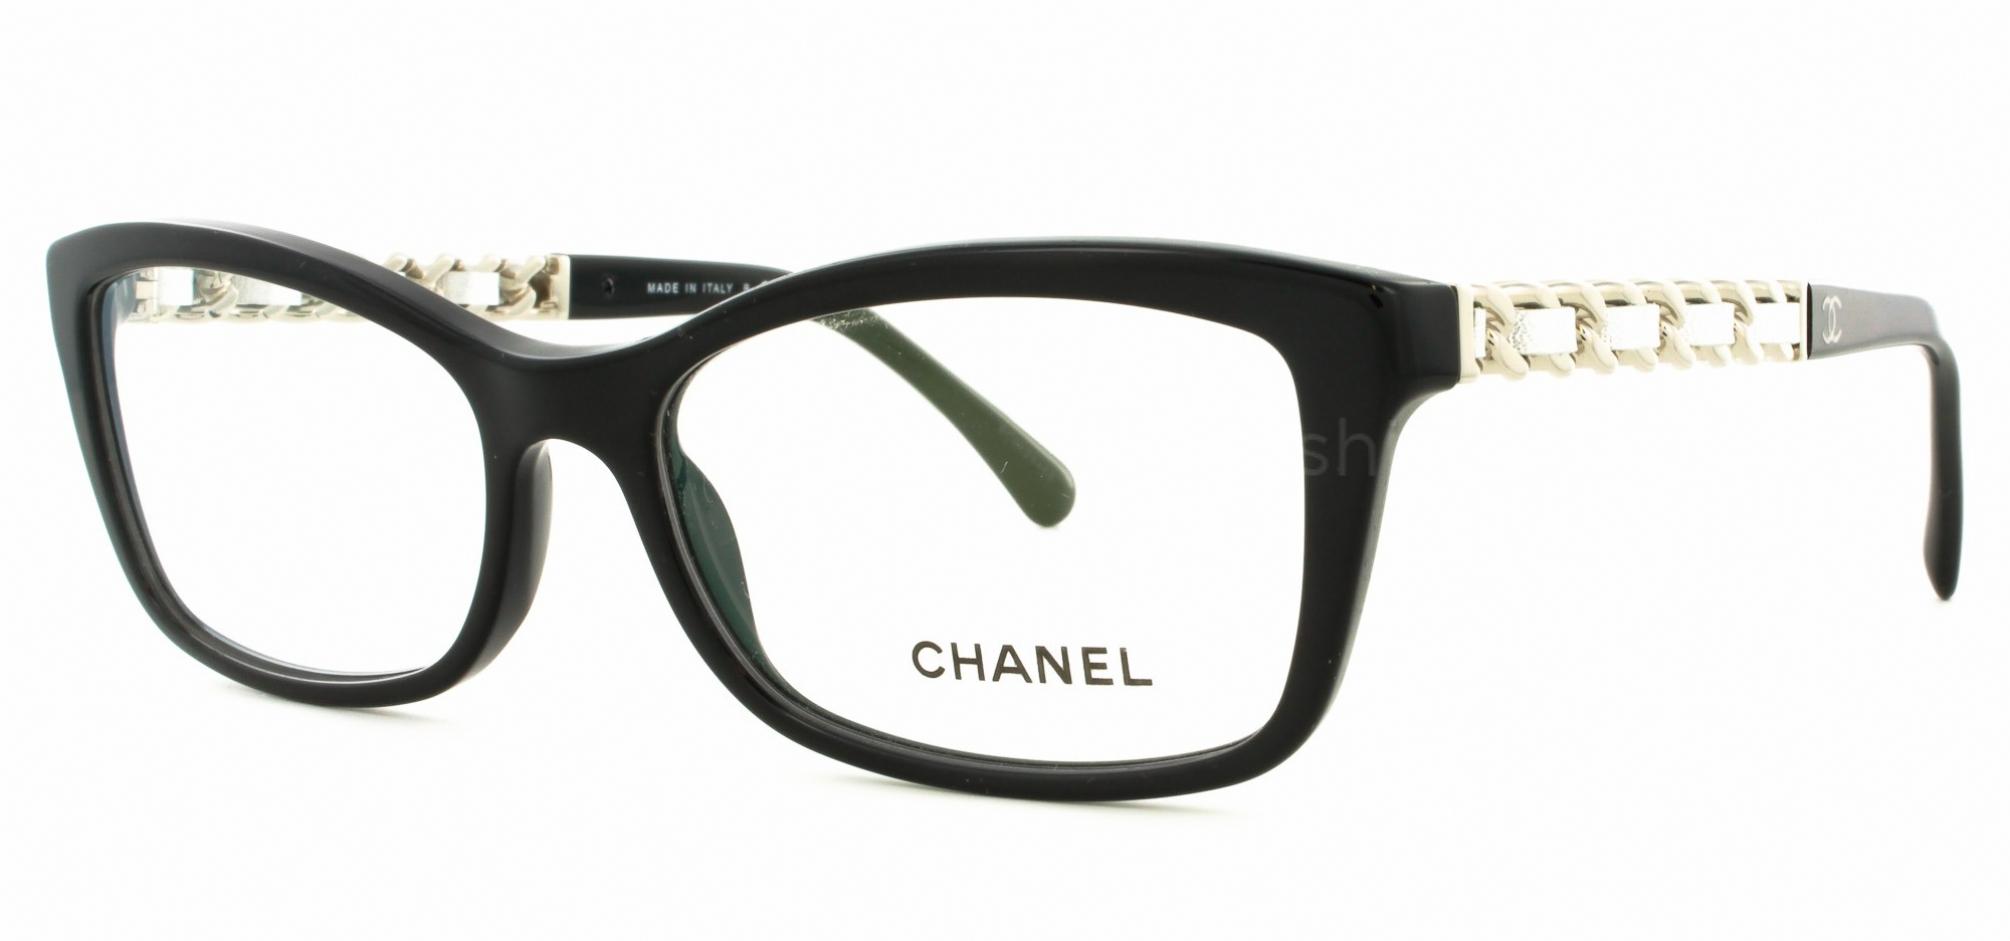 Chanel Eyeglass Frames : Chanel 3264q Eyeglasses